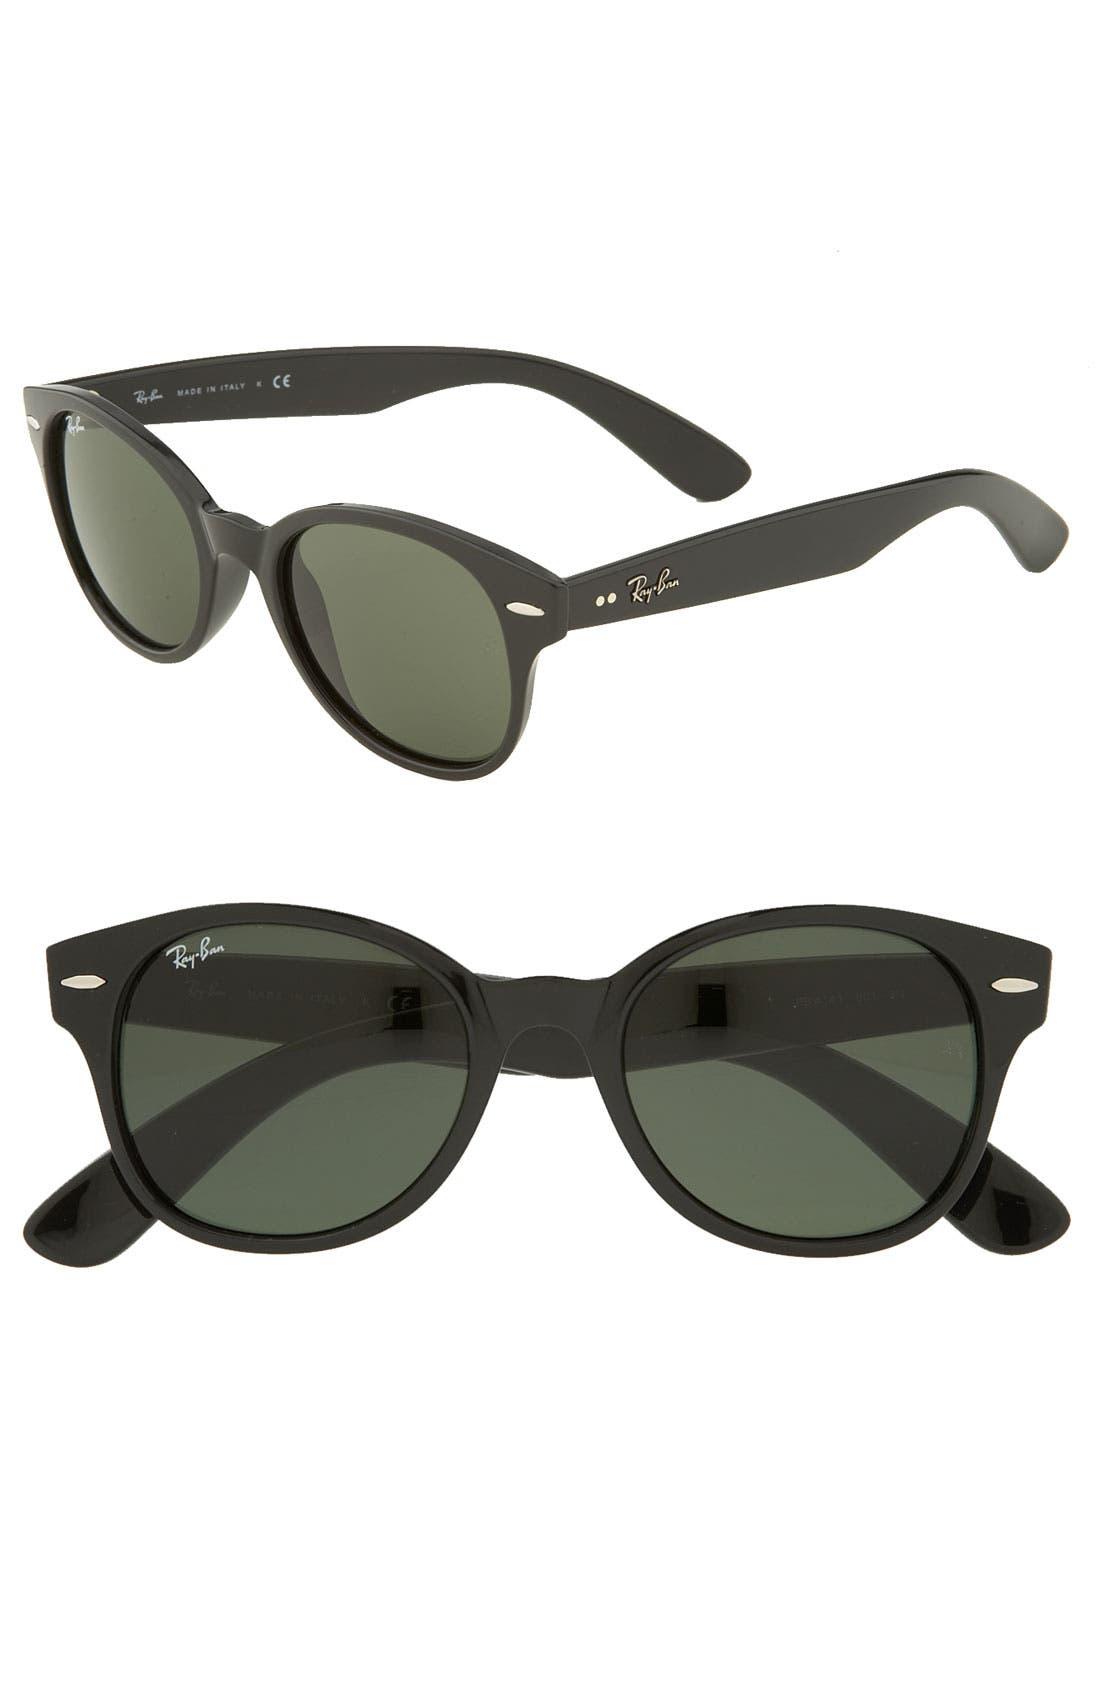 Main Image - Ray-Ban 'High Street Wayfarer' Sunglasses